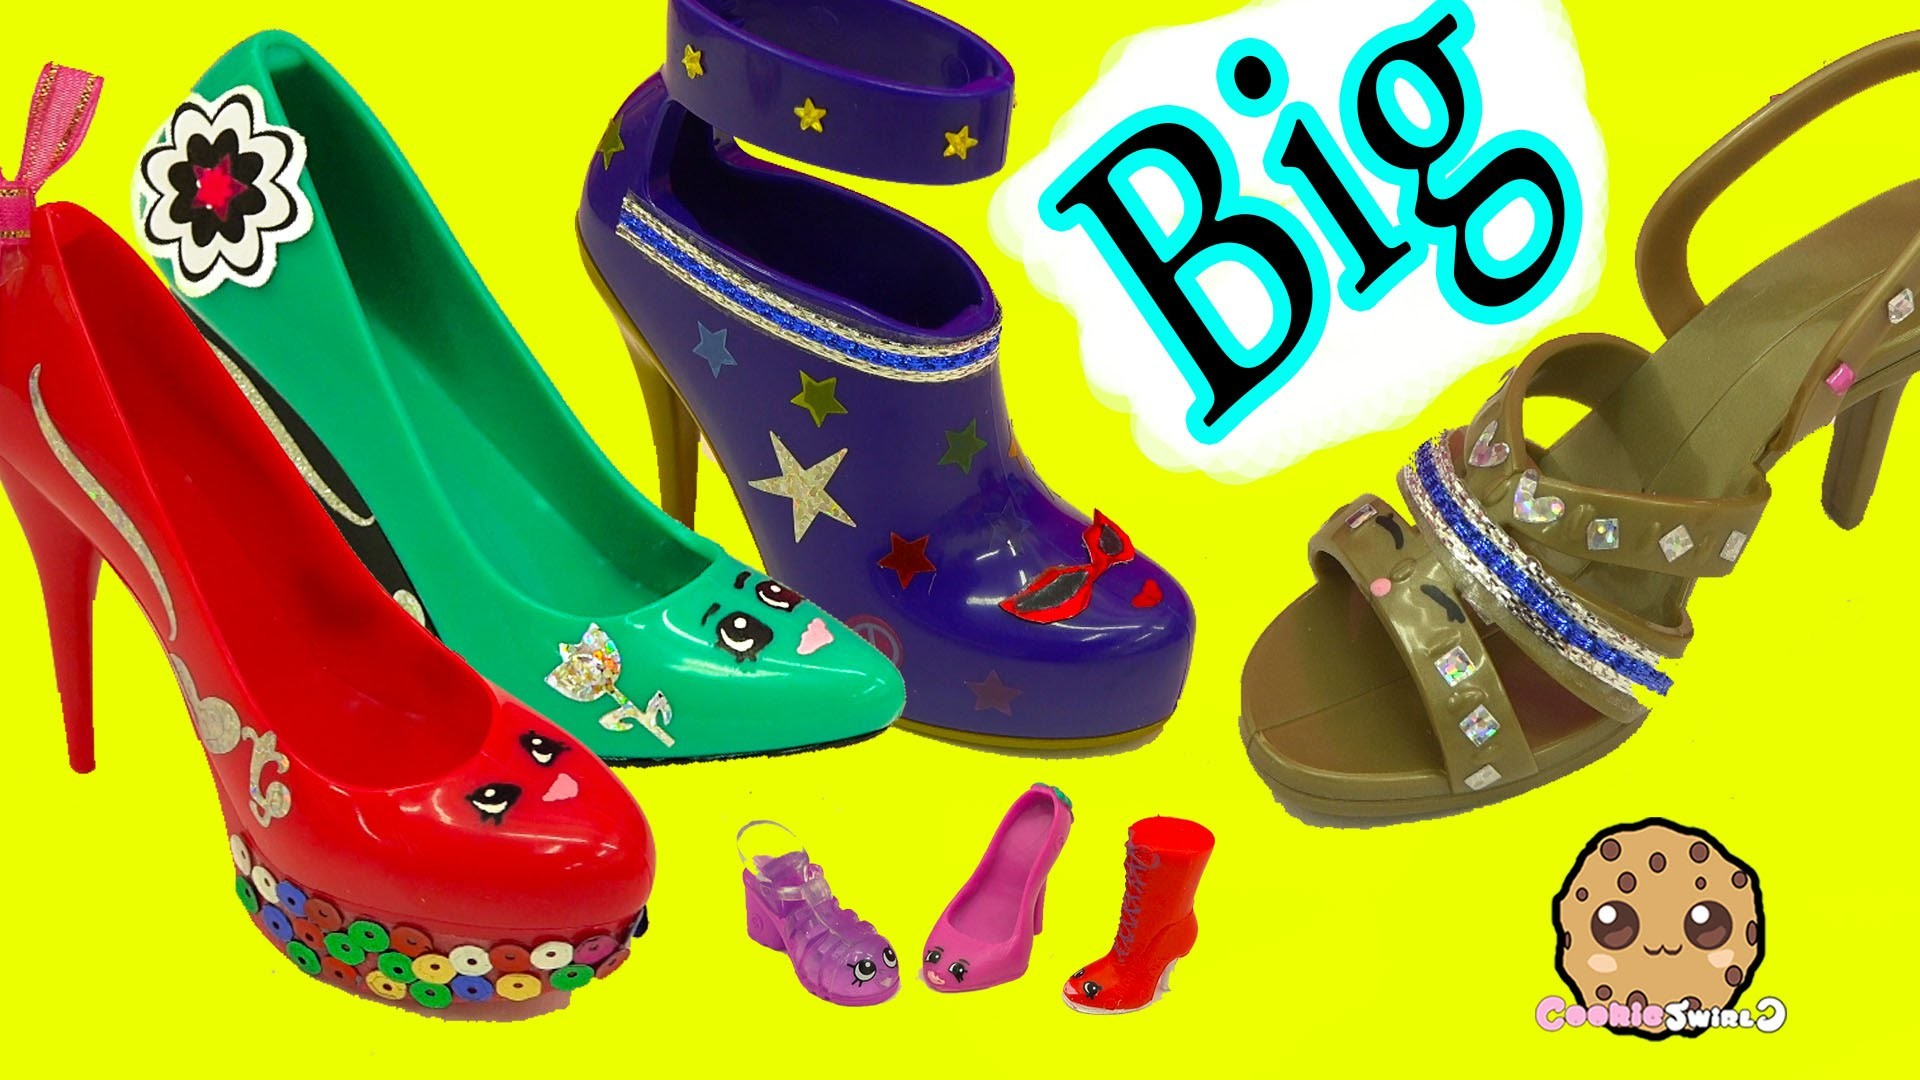 Painting + Designing Large Big Shopkins Inspired Shoes - Crayola Shoe Designer Studio Craft Playset